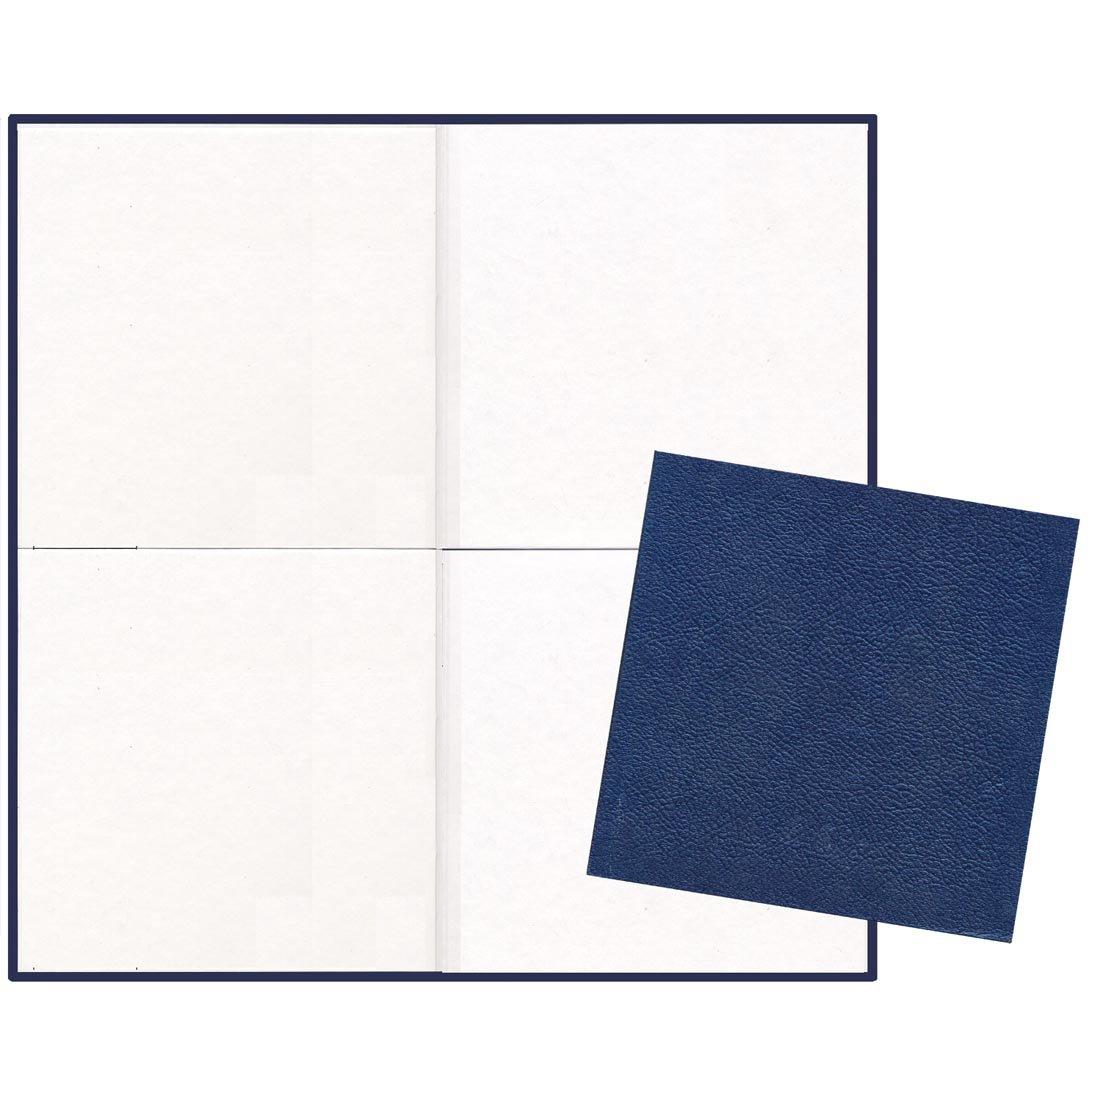 Gameboard, Blank, Folding, 18x18